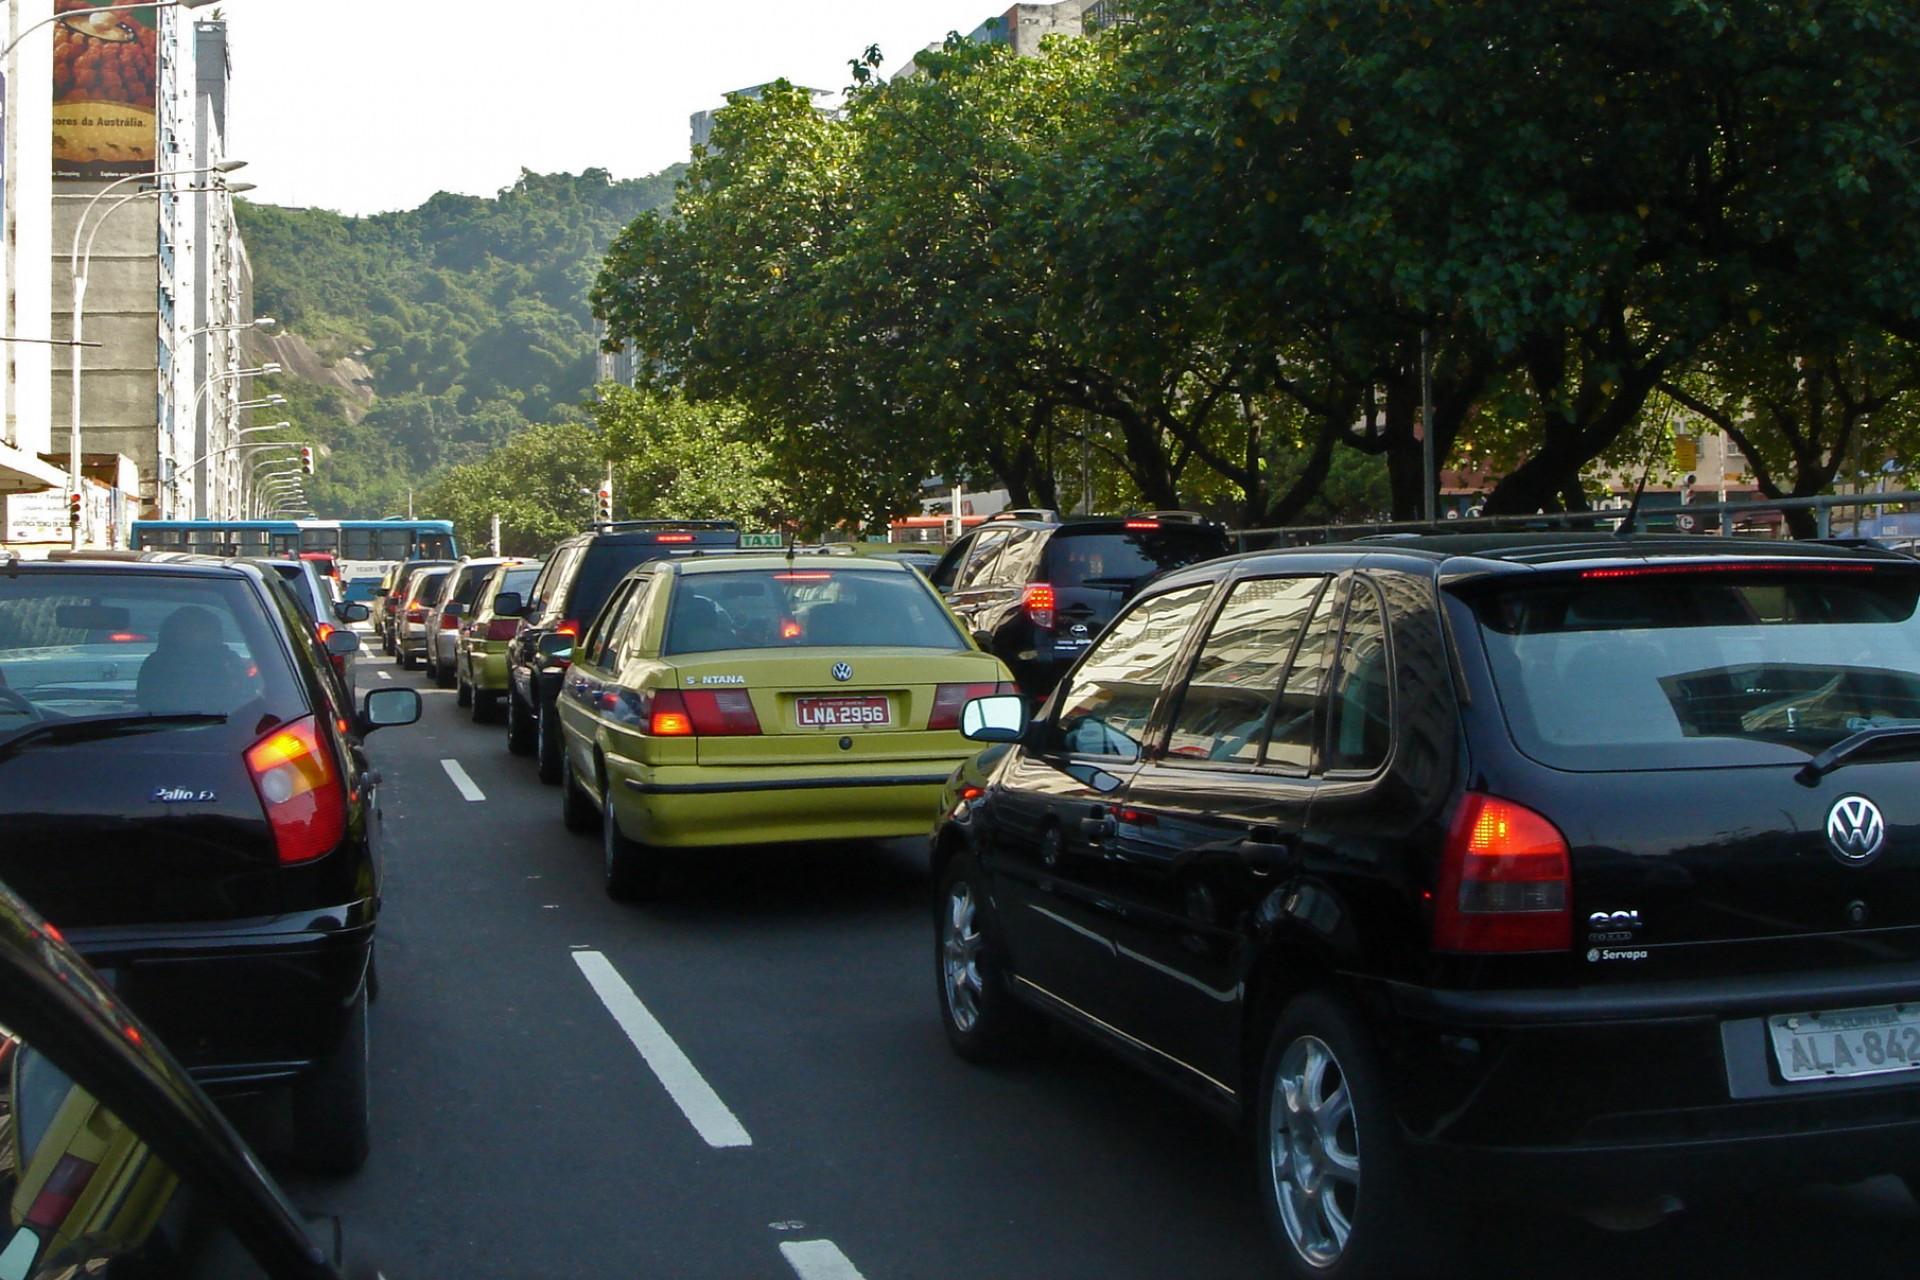 011 Essay Example On Road Accident Wikipedia Traffic Jam Rio De Janeiro 03 2008 28 Imposing 1920